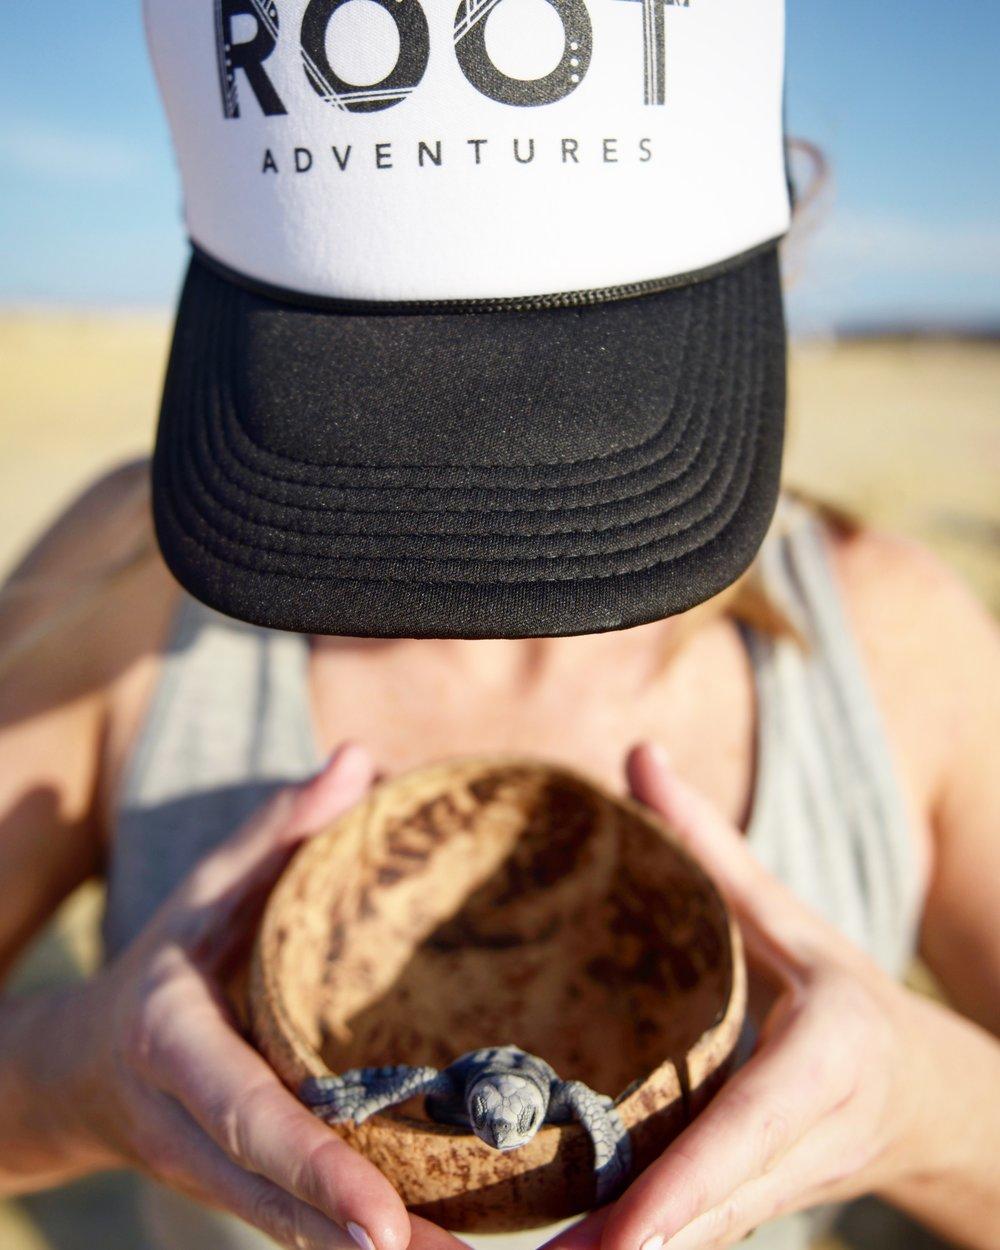 Releasing Sea turtles on the shores of Todos Santos